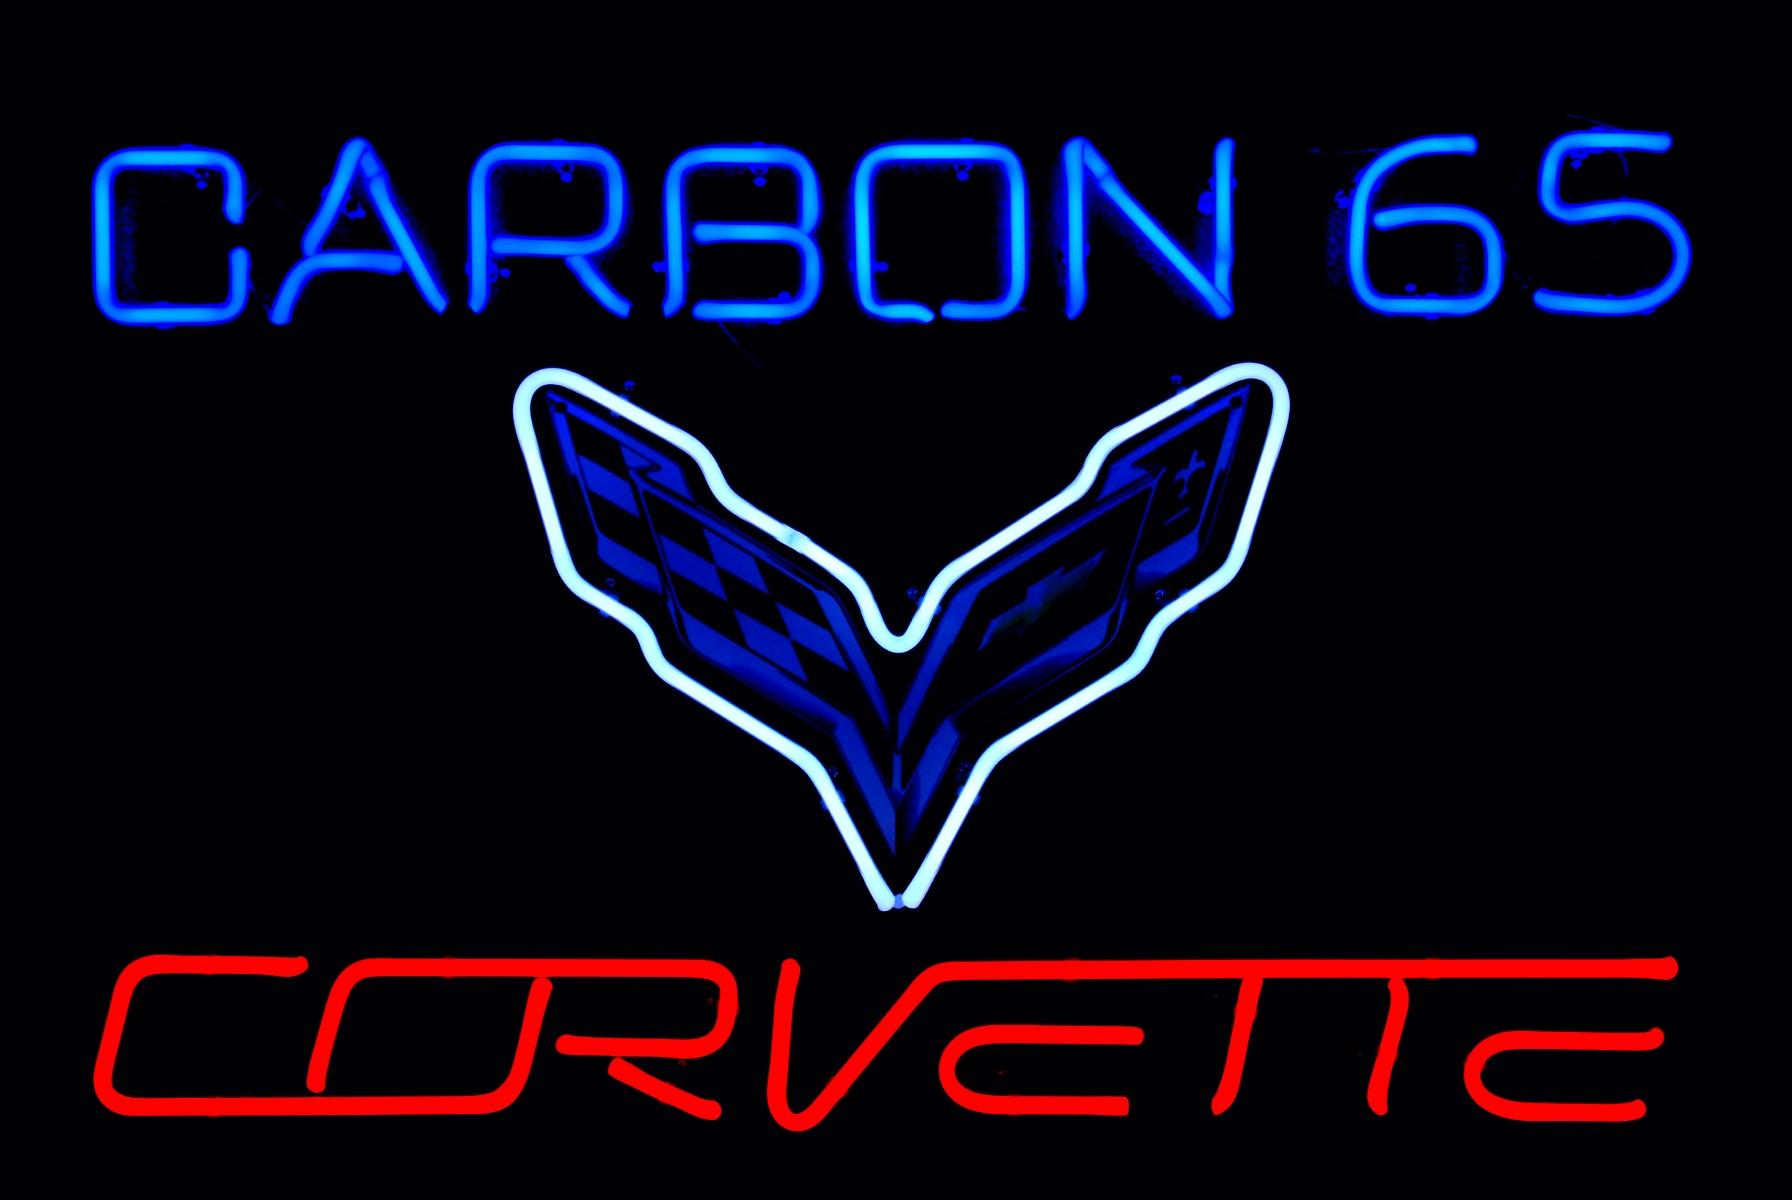 New Car Dealership Neon Signs by John Barton - Famous USA Neon Glass Artist - BartonNeonMagic.com